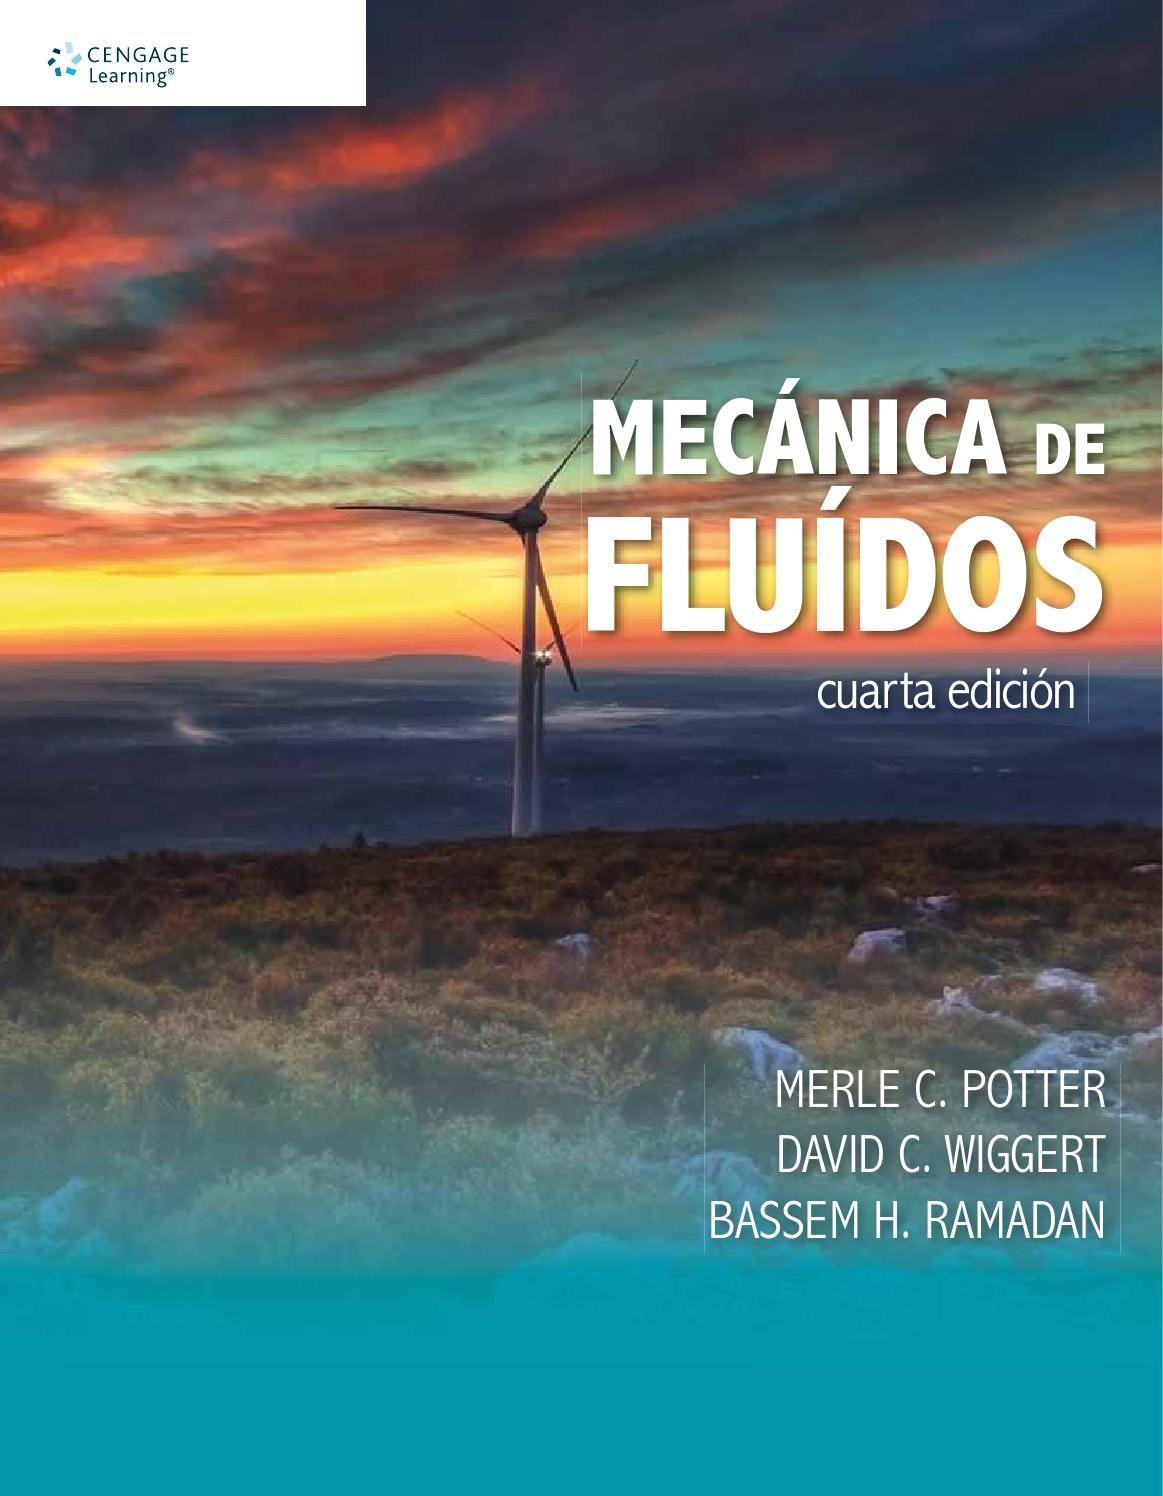 Mecánica De Fluidos 4a Ed Merle C Potter Et Al Mecanica De Fluidos Libros De Calculo Todo Fluye